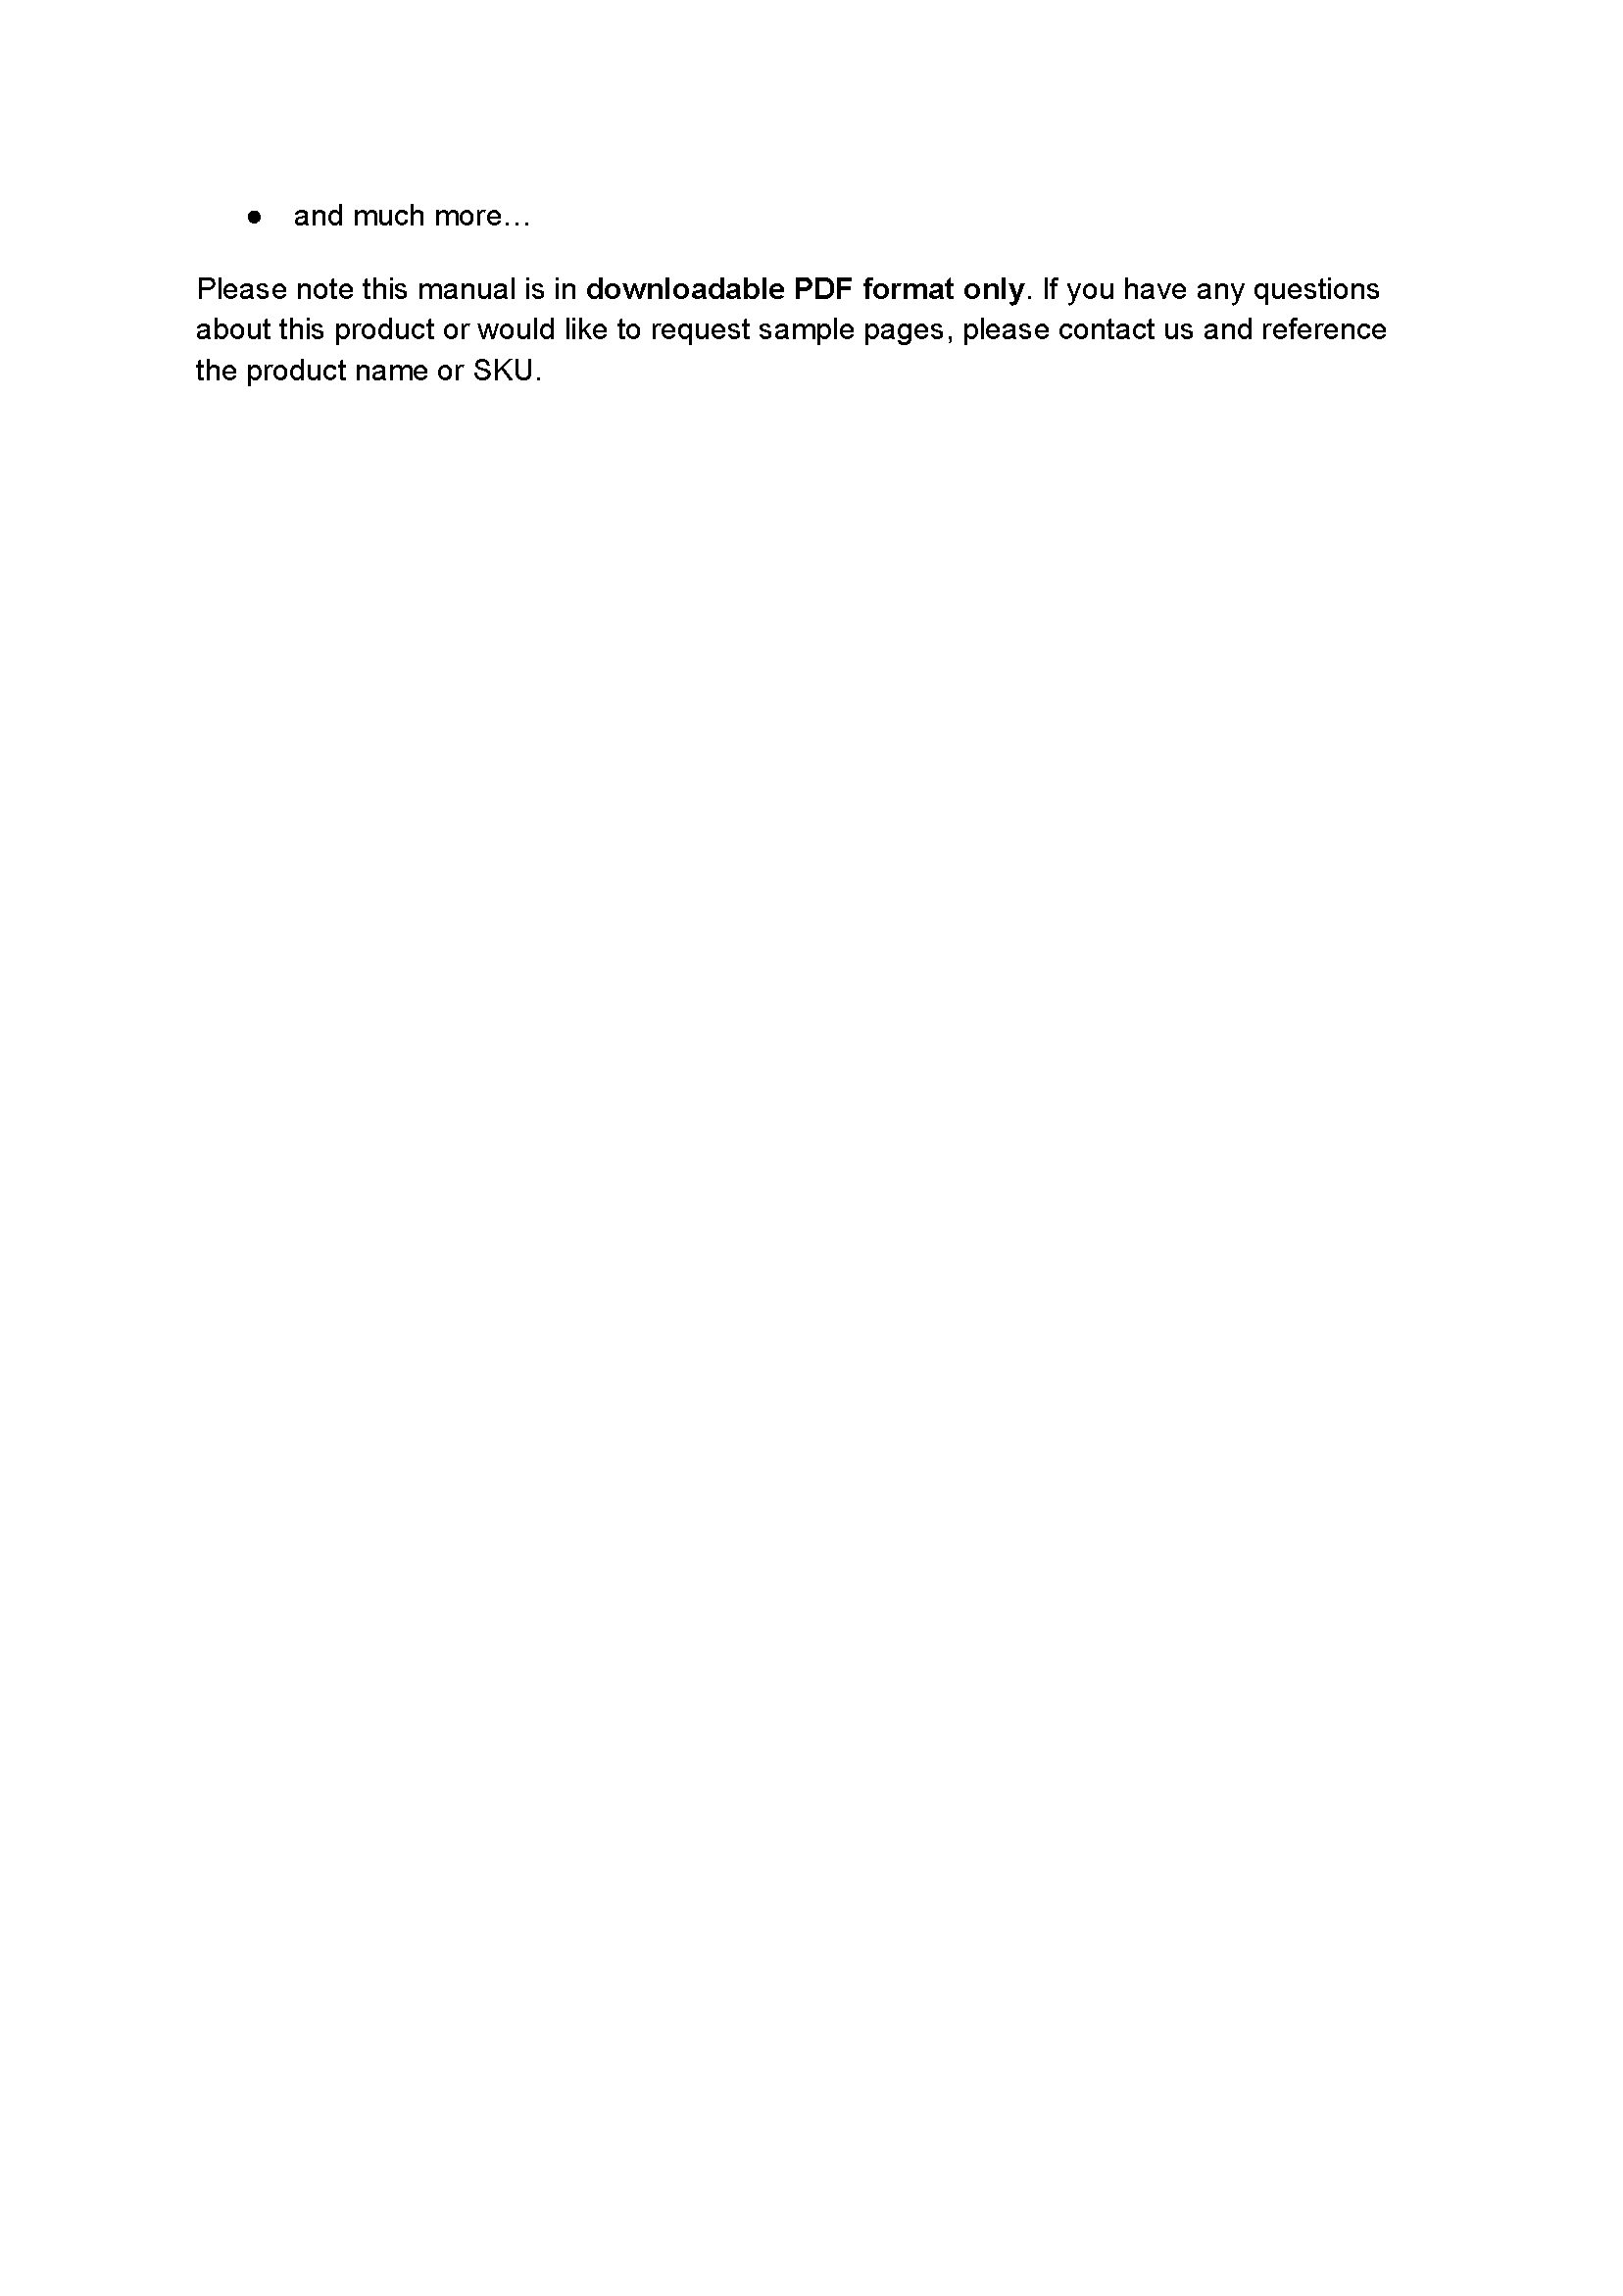 John Deere 5425 manual